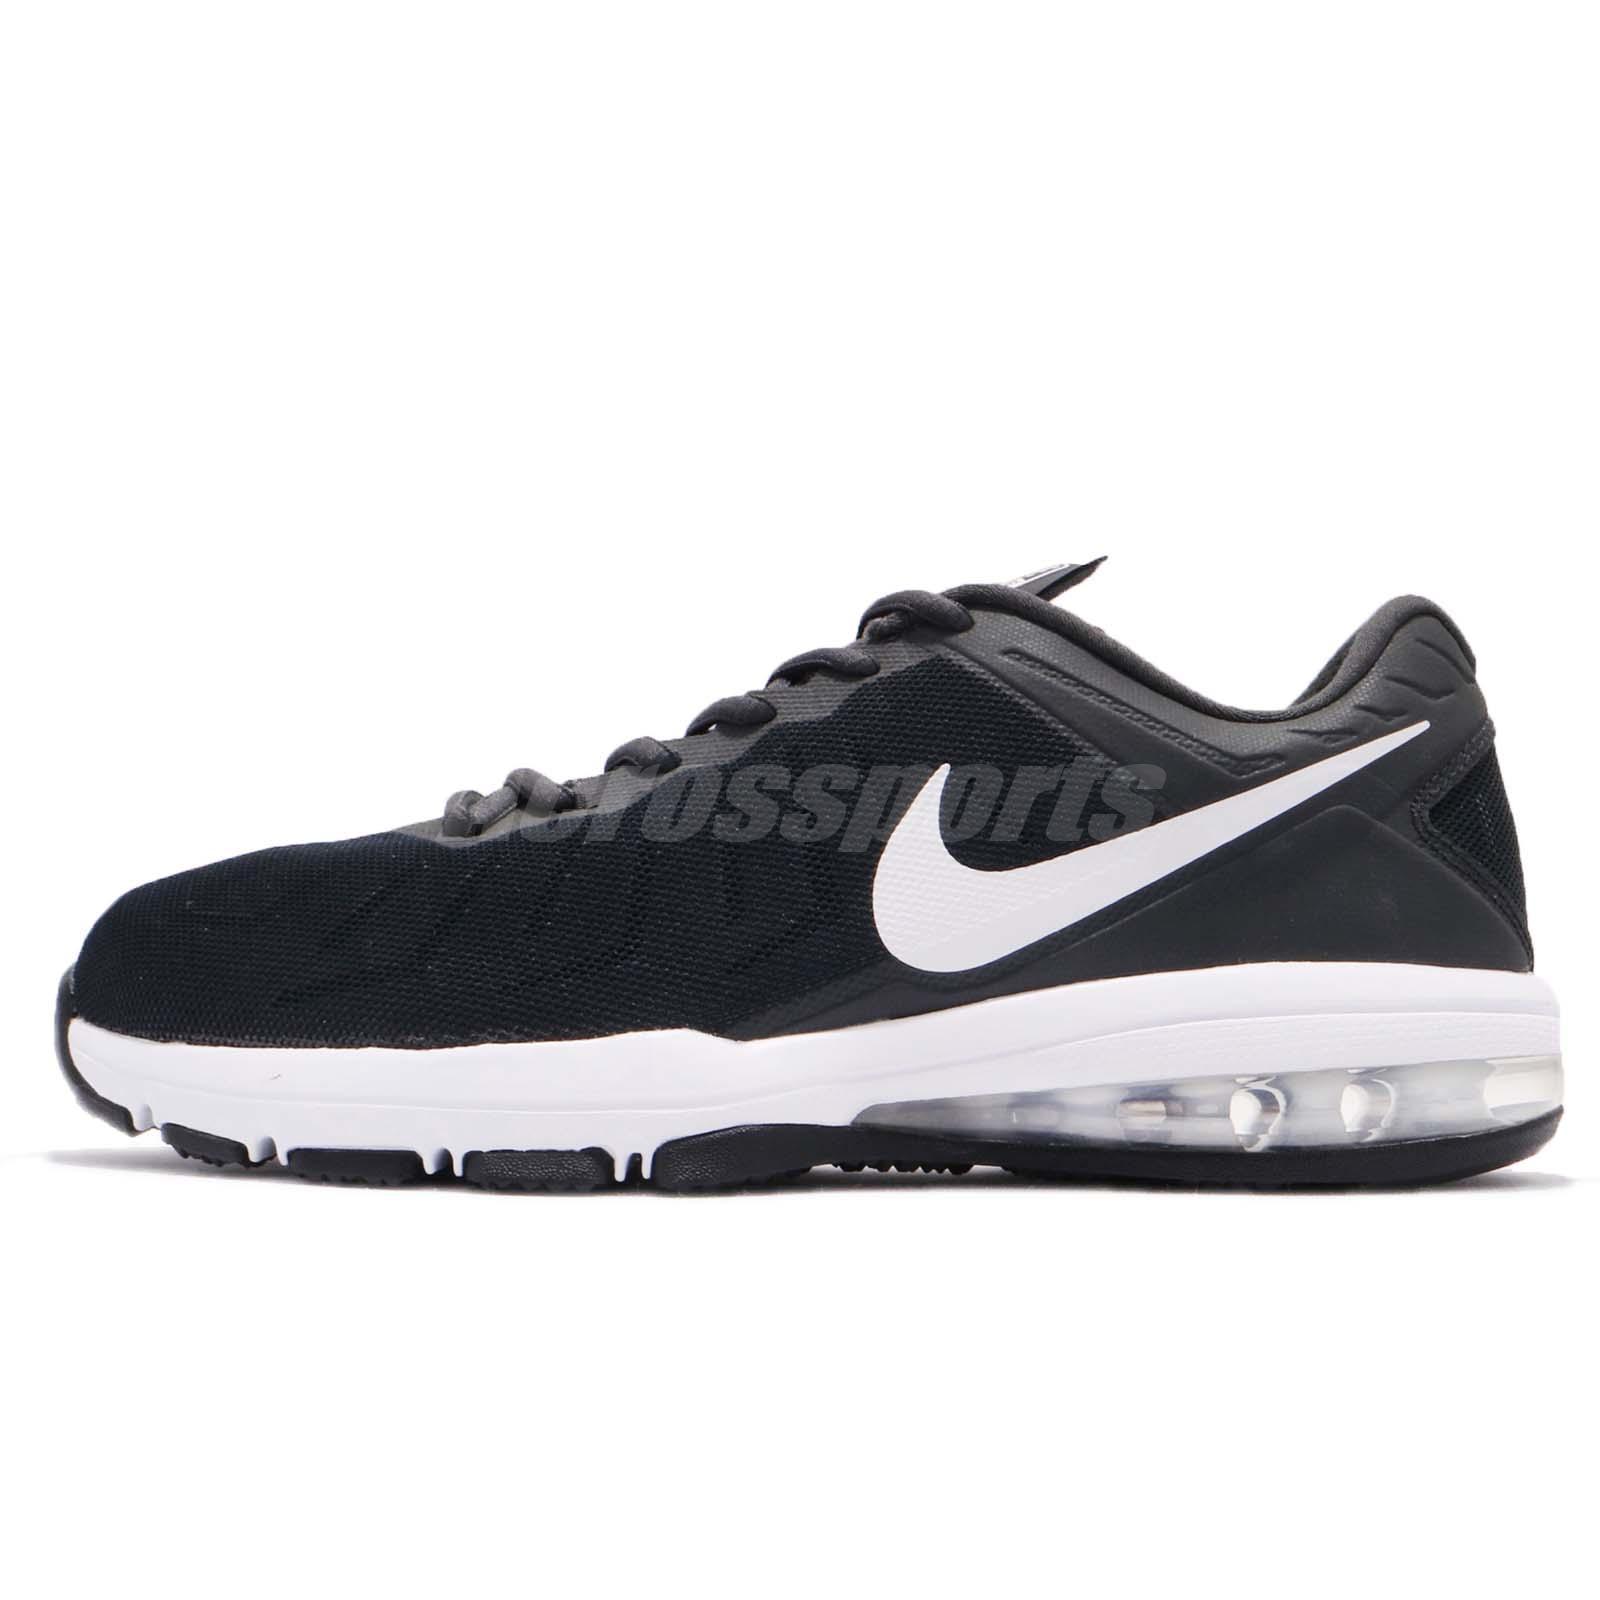 Nike air max torch 4 running shoe - Nike Air Max Full Ride Tr Black Grey Mens Cross Training Shoes 819004 001